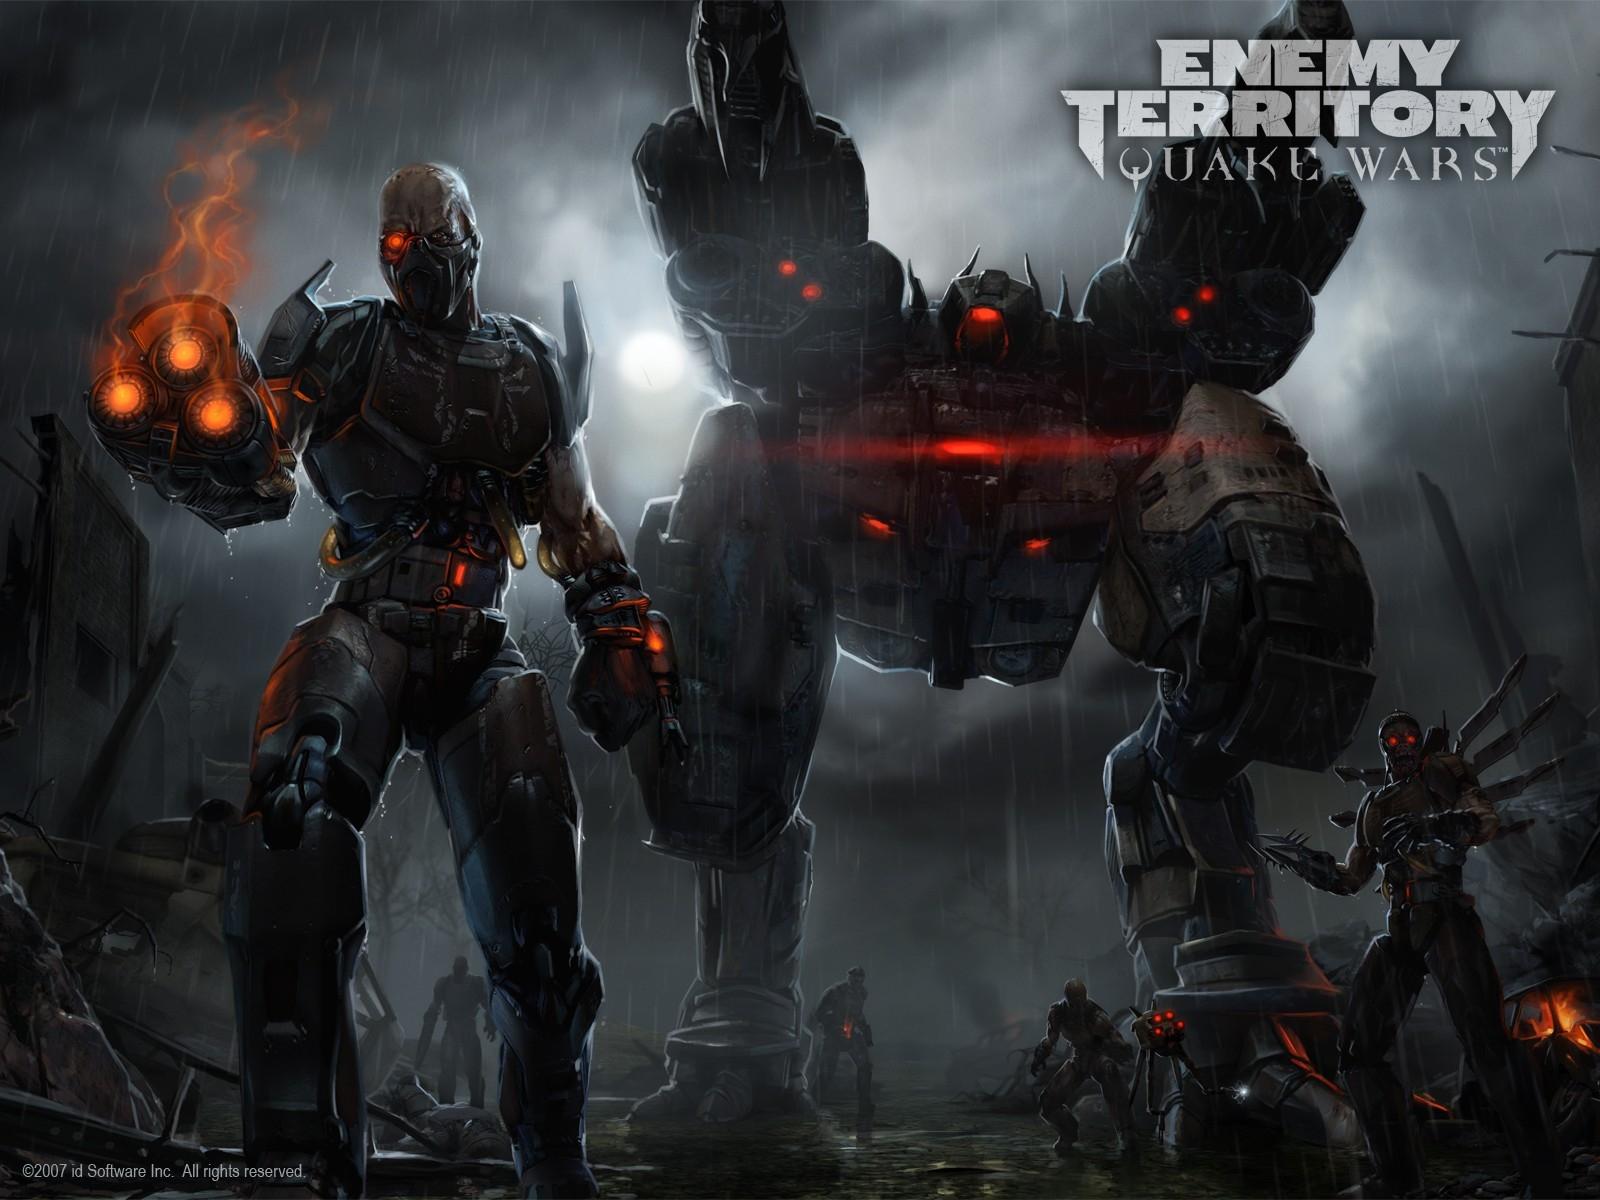 enemy-territory-quake-wars